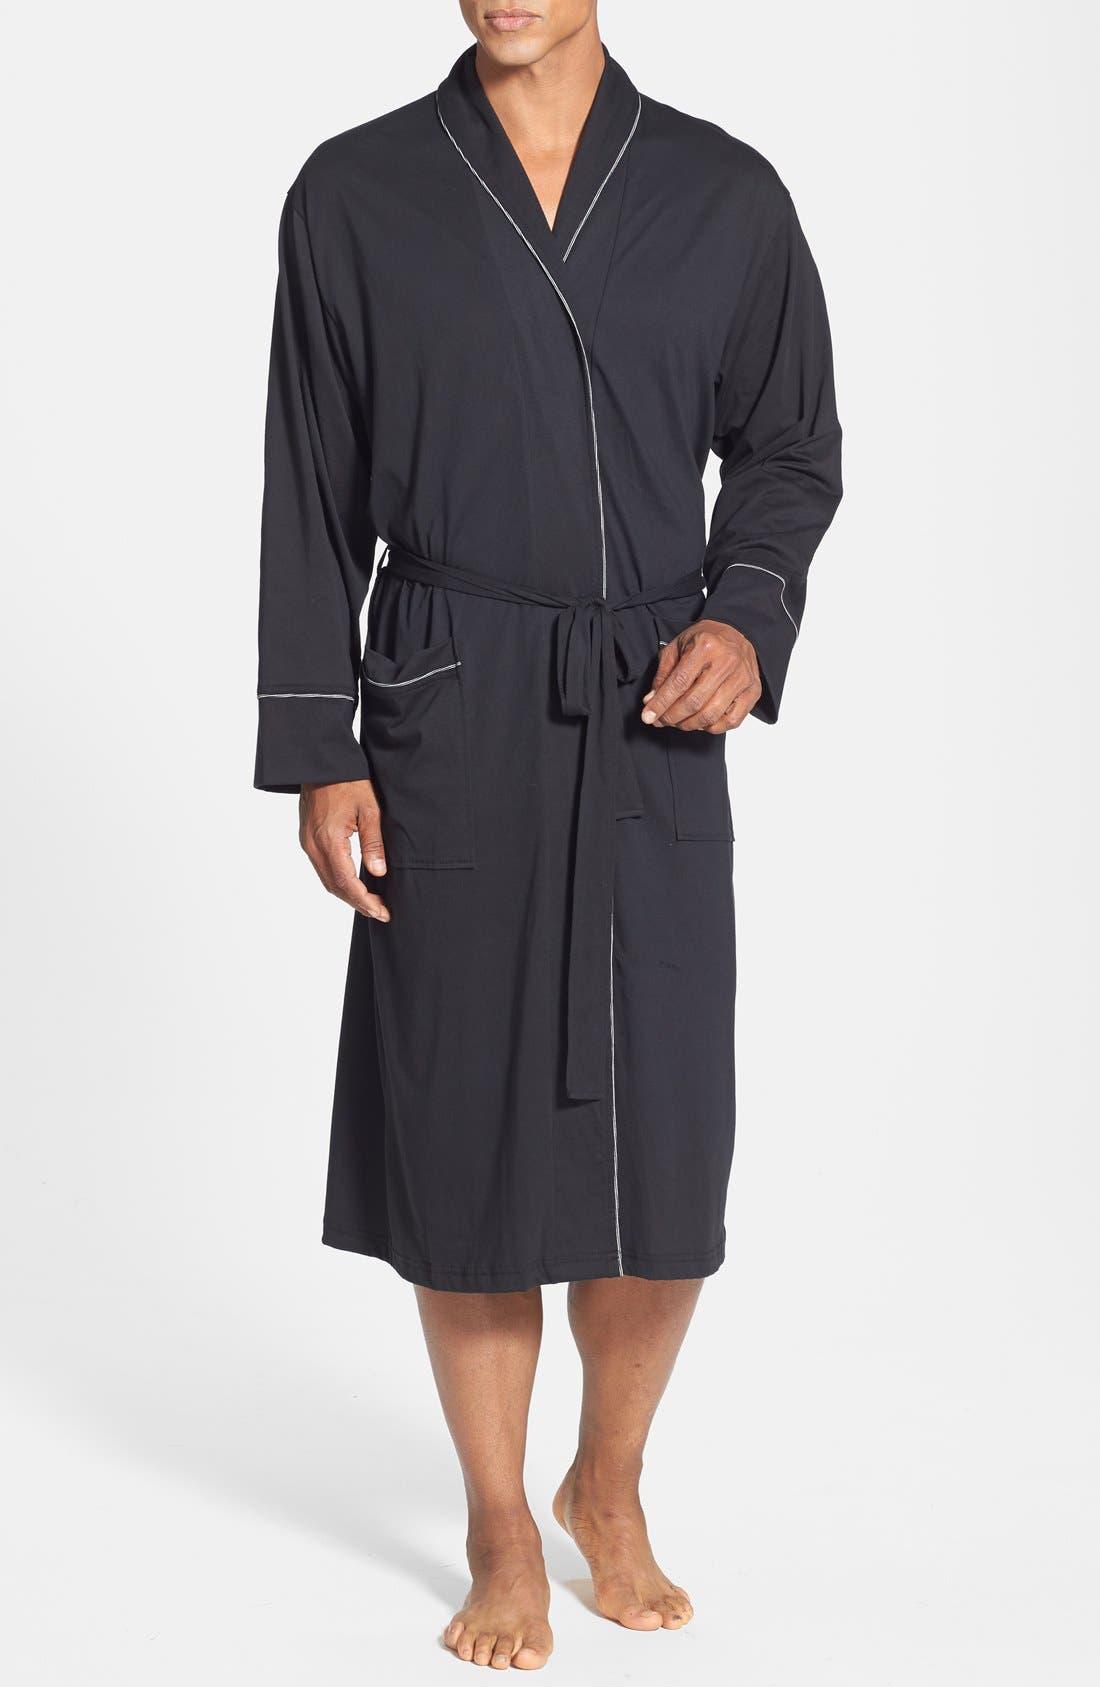 Alternate Image 1 Selected - Daniel Buchler Peruvian Pima Cotton Robe